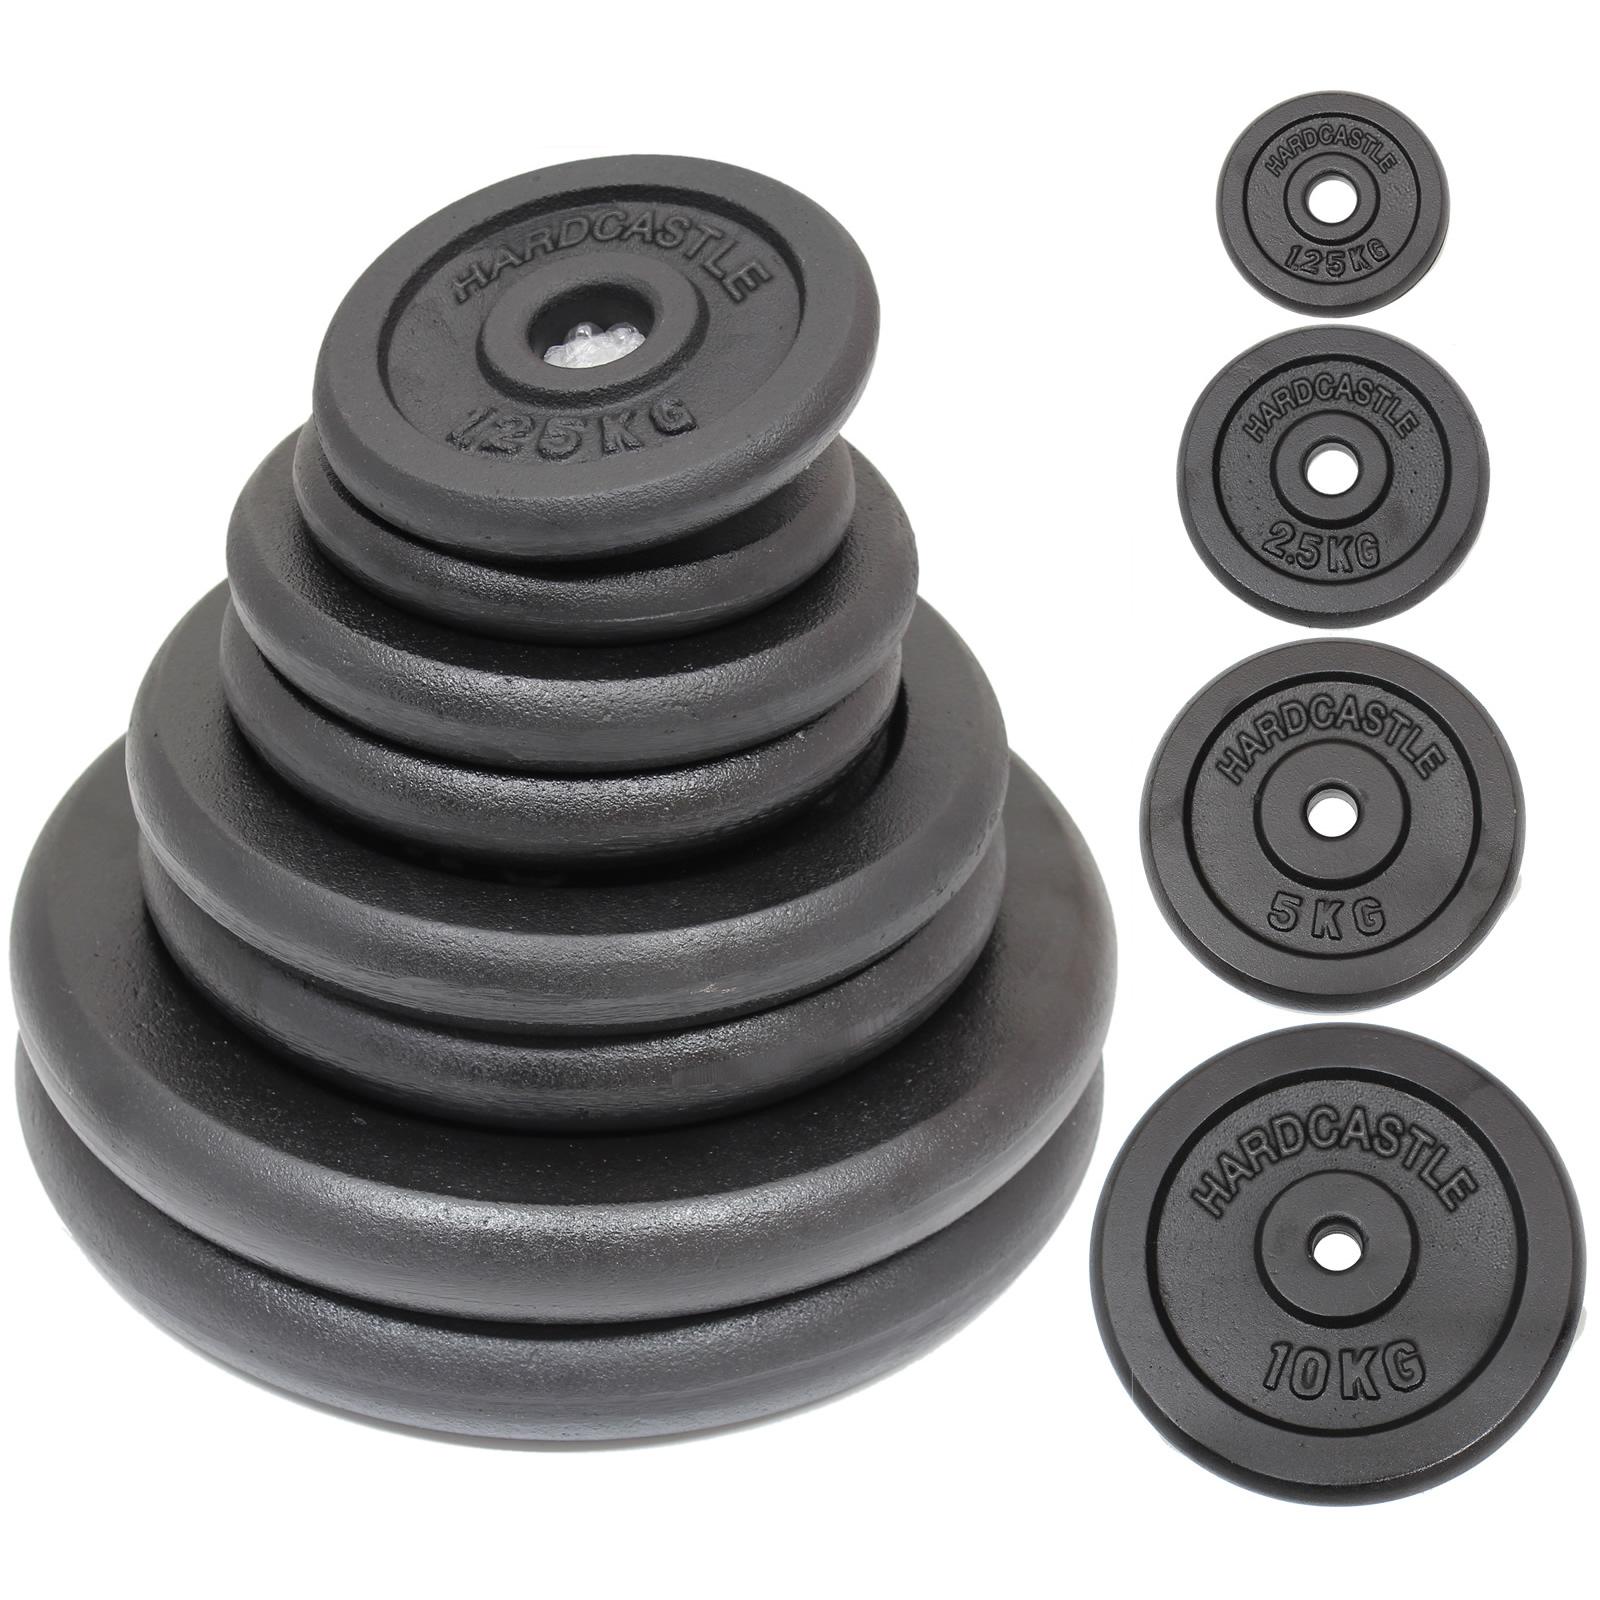 Standard weight plates pixshark images